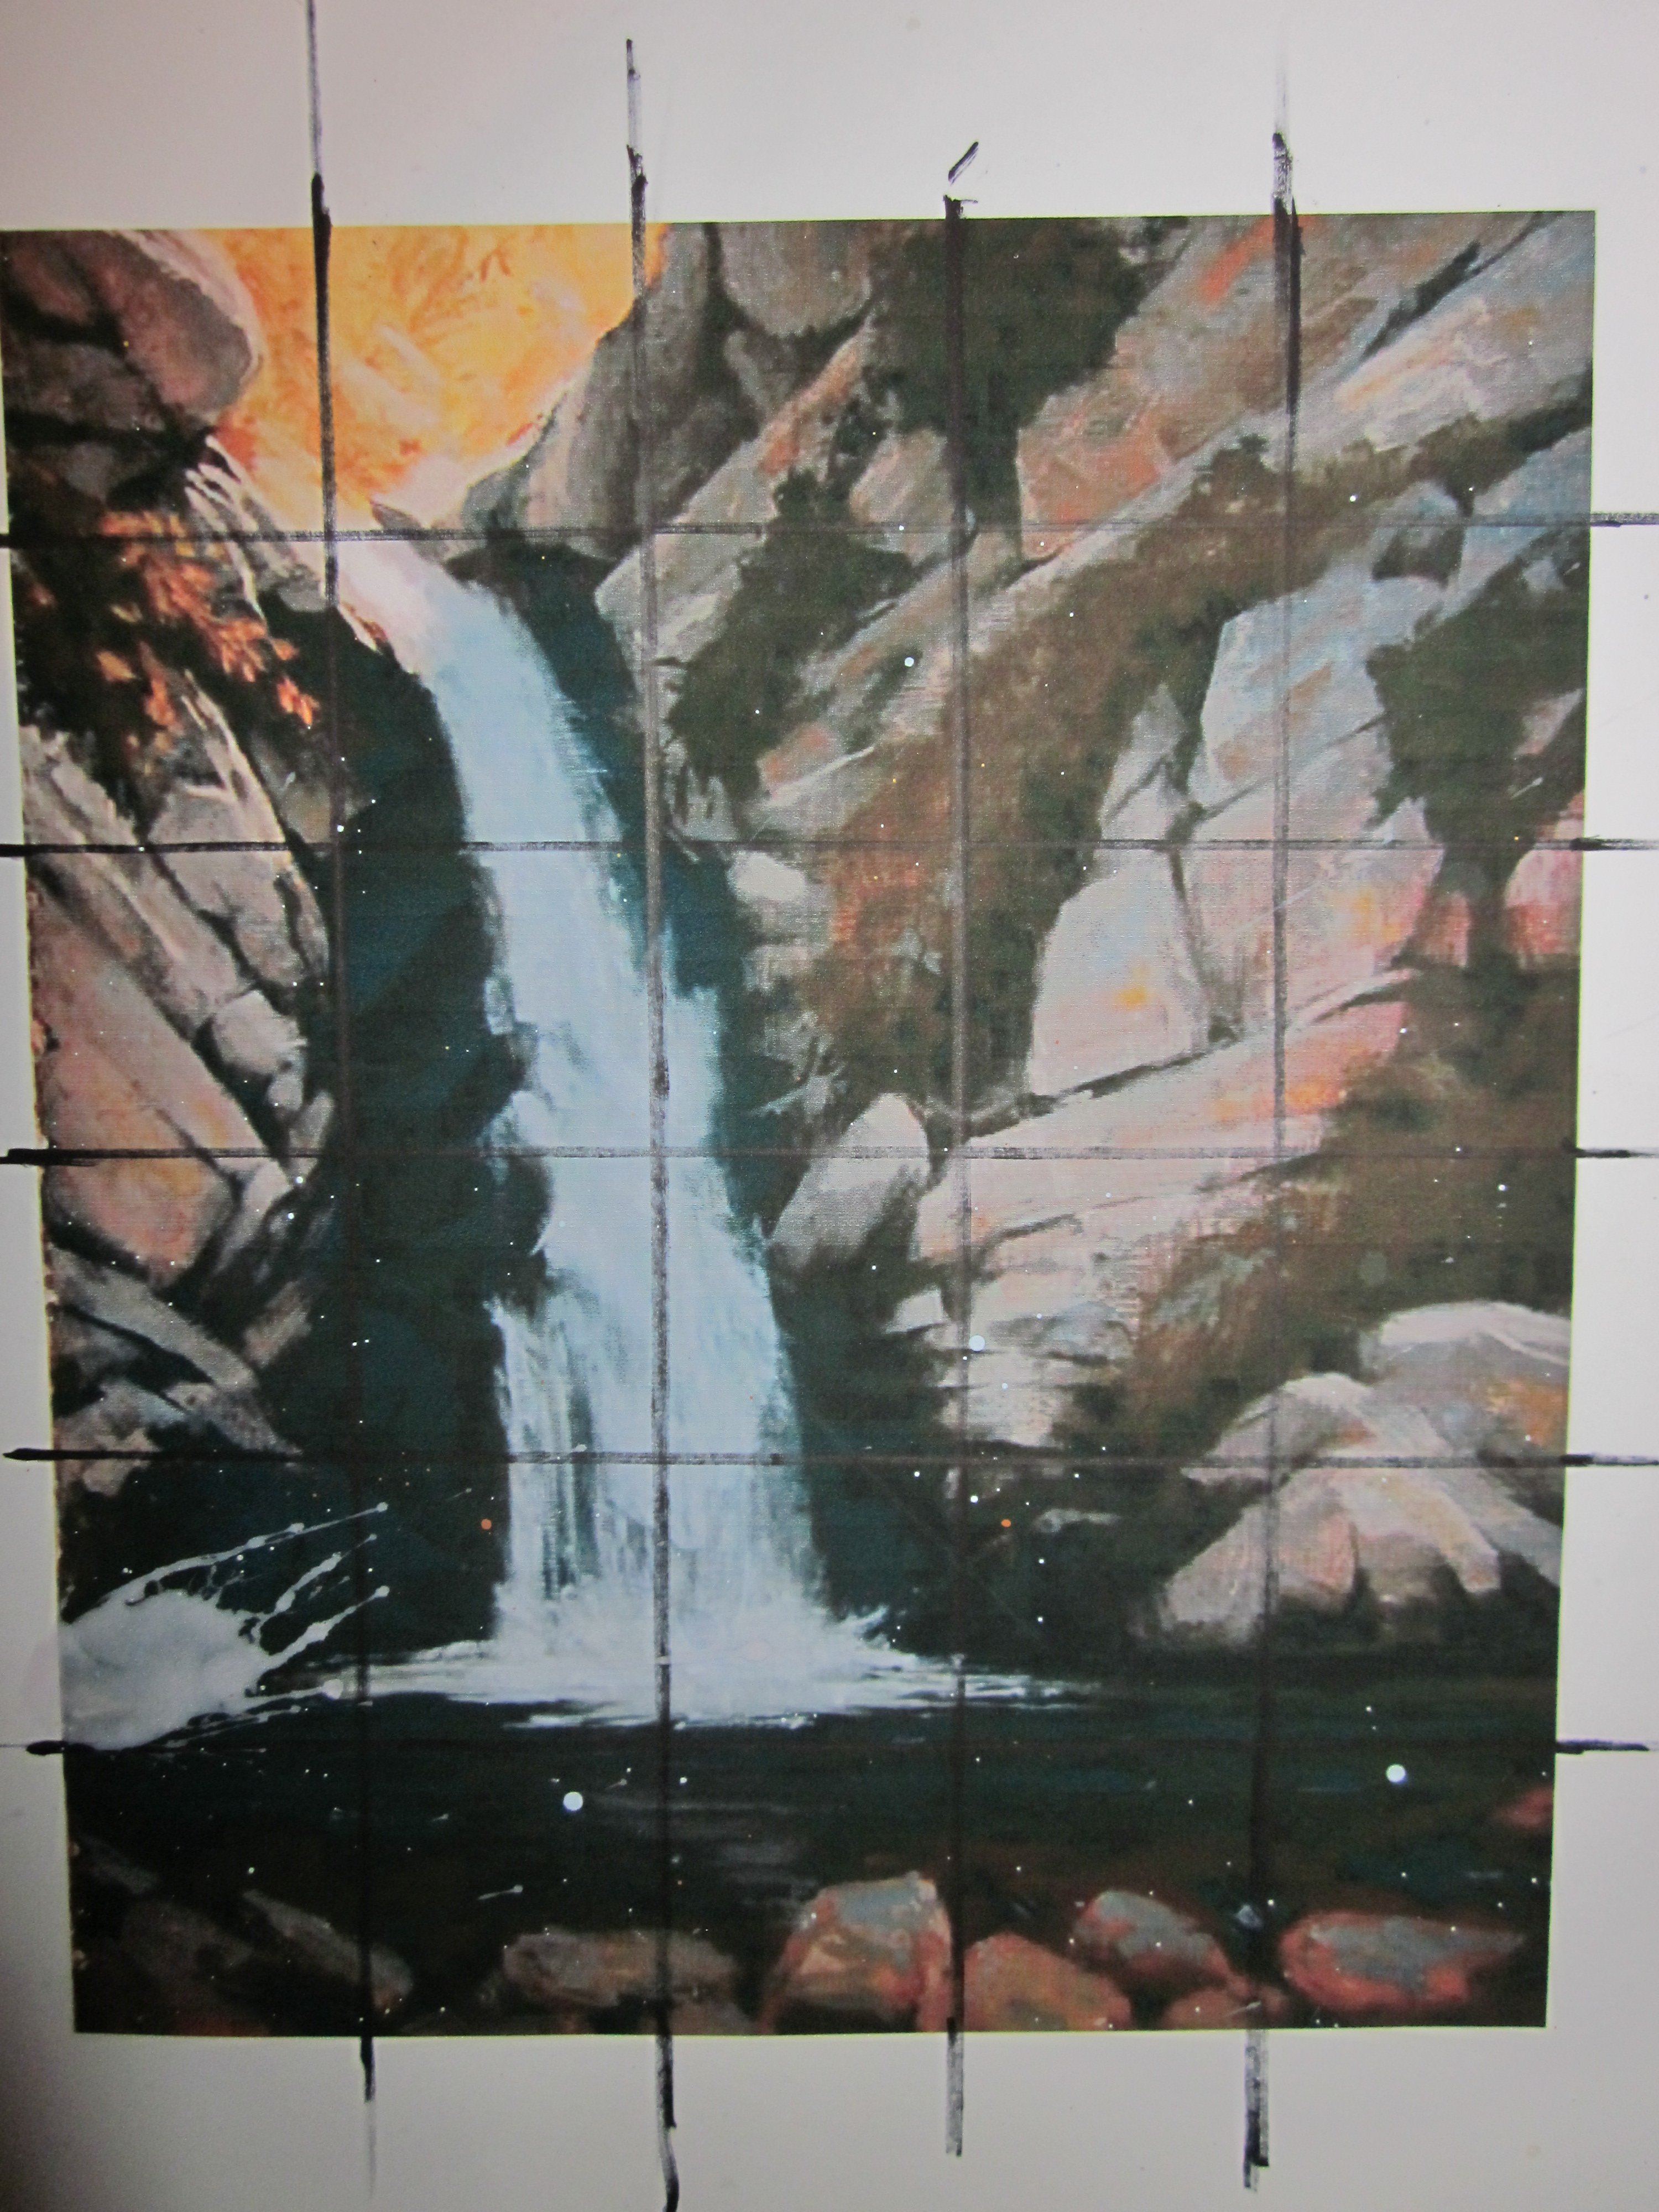 Scenic Painting - Original Image